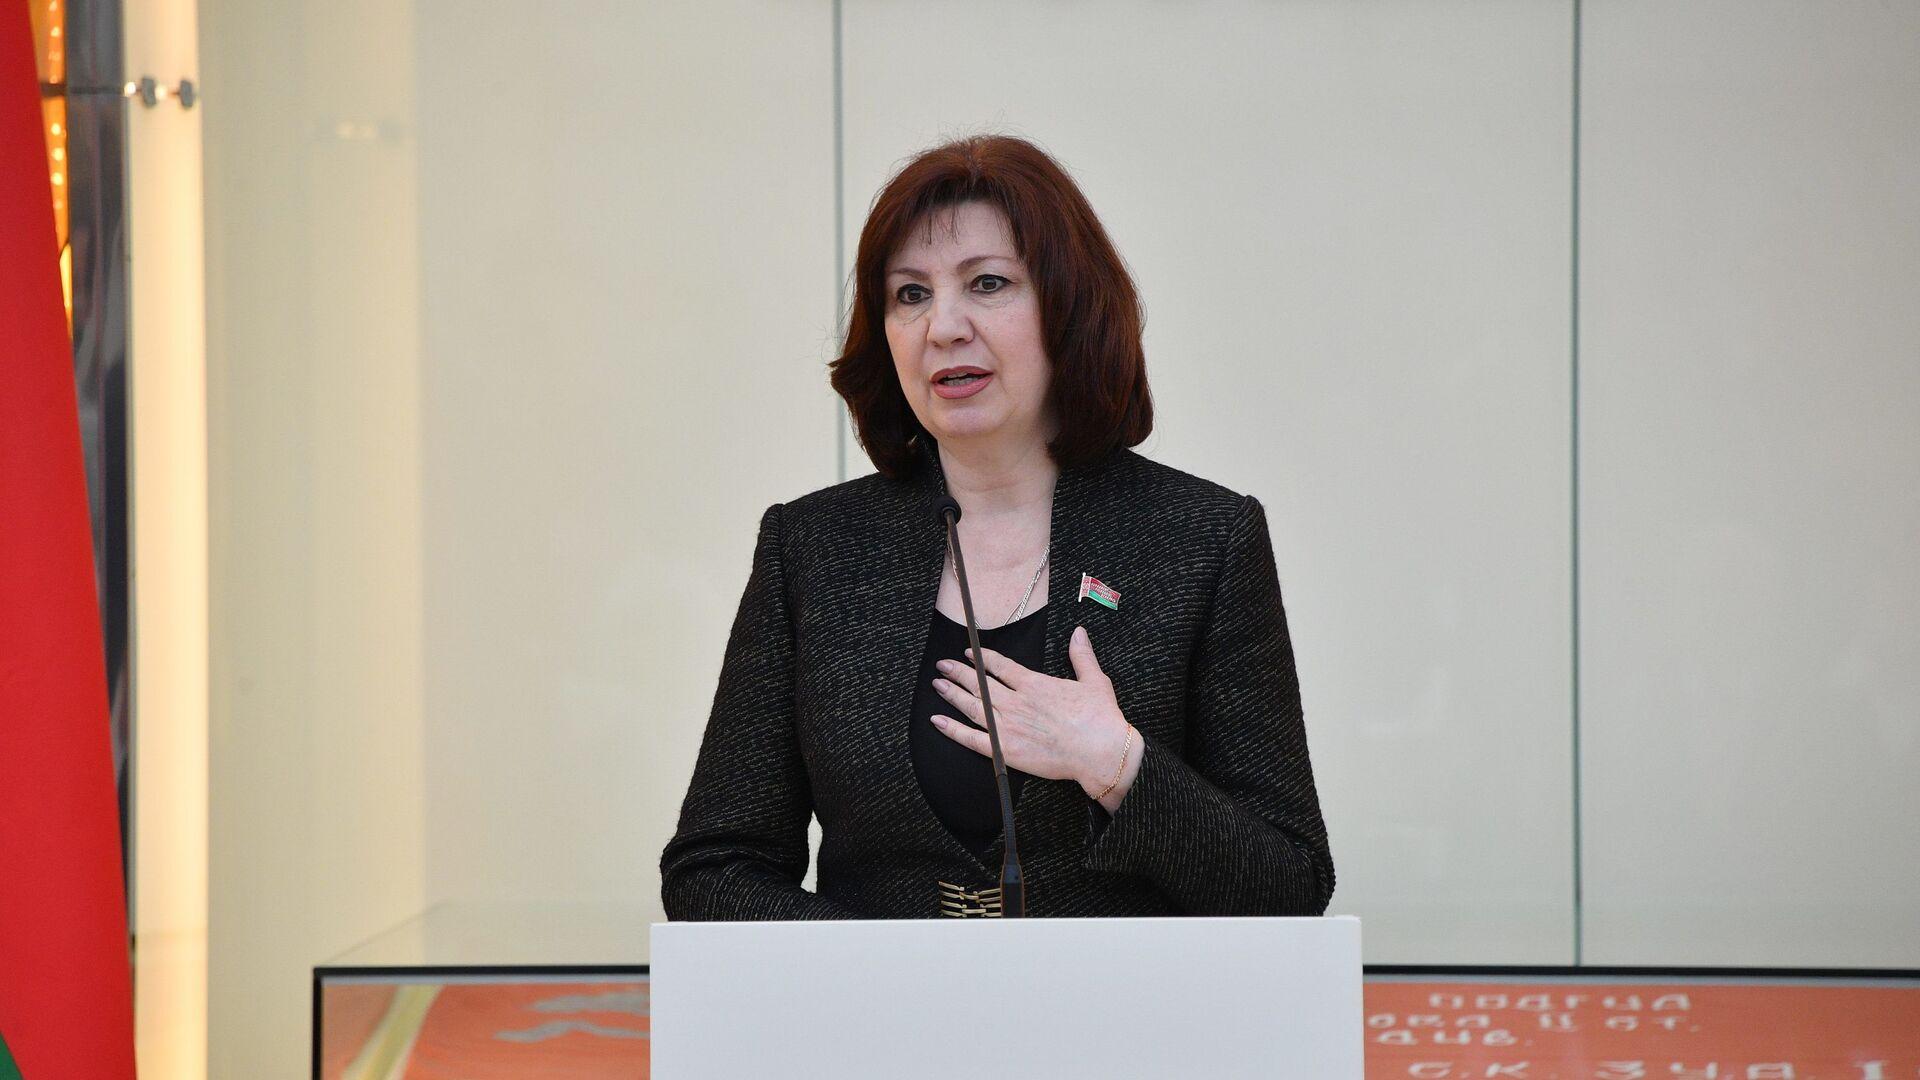 Наталья Кочанова - Sputnik Беларусь, 1920, 05.08.2021